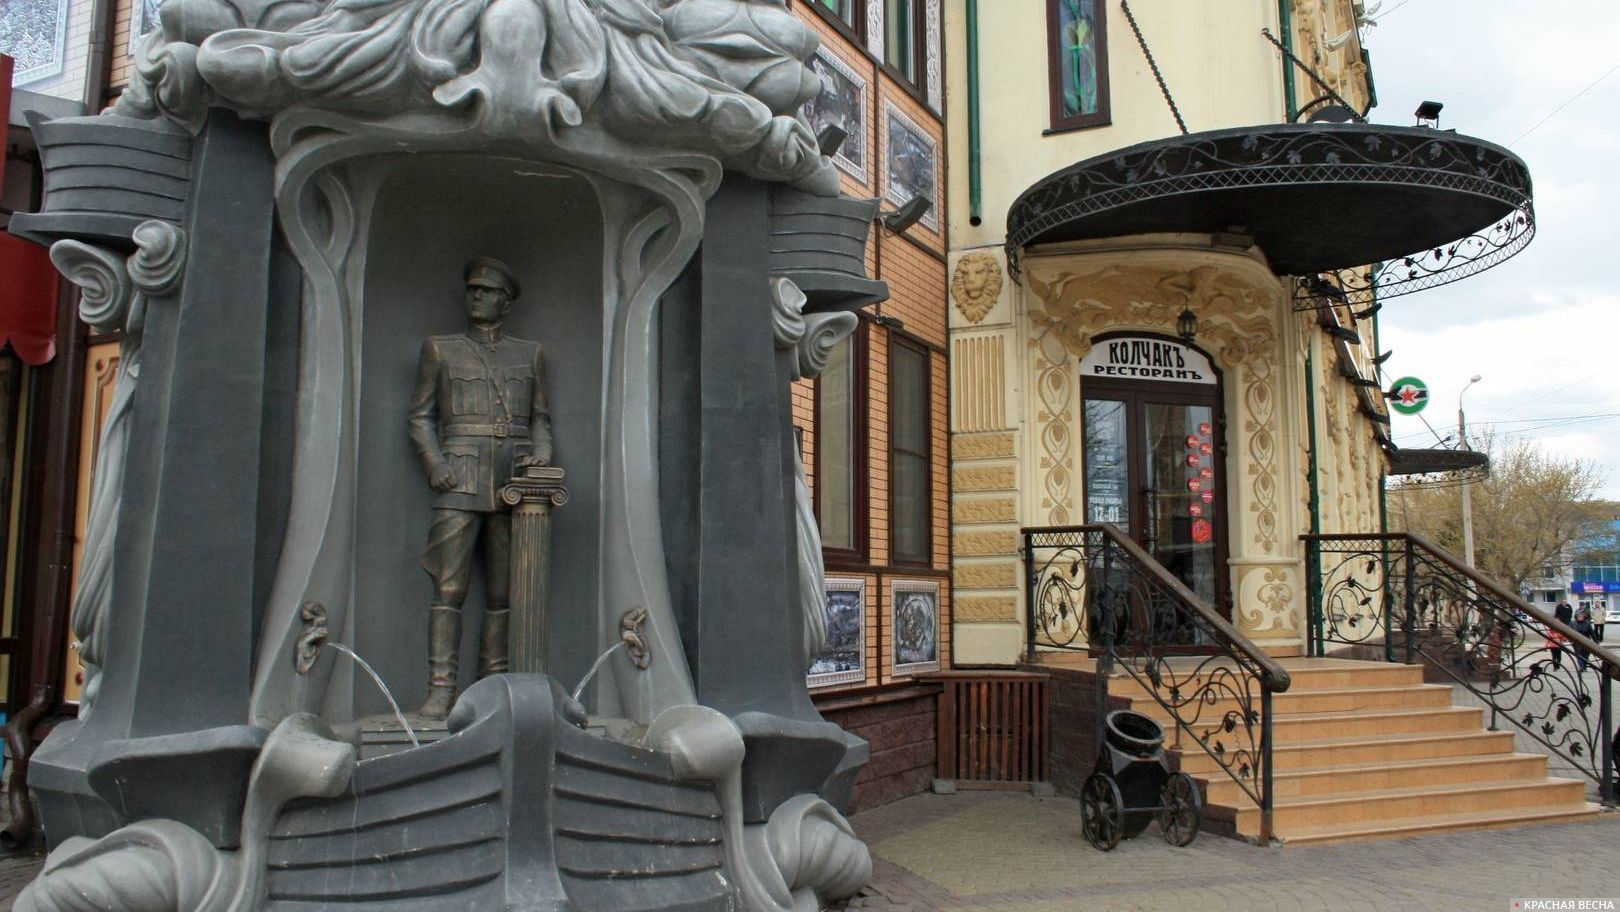 Статуя А.В. Колчака у ресторана «Колчак». Омск